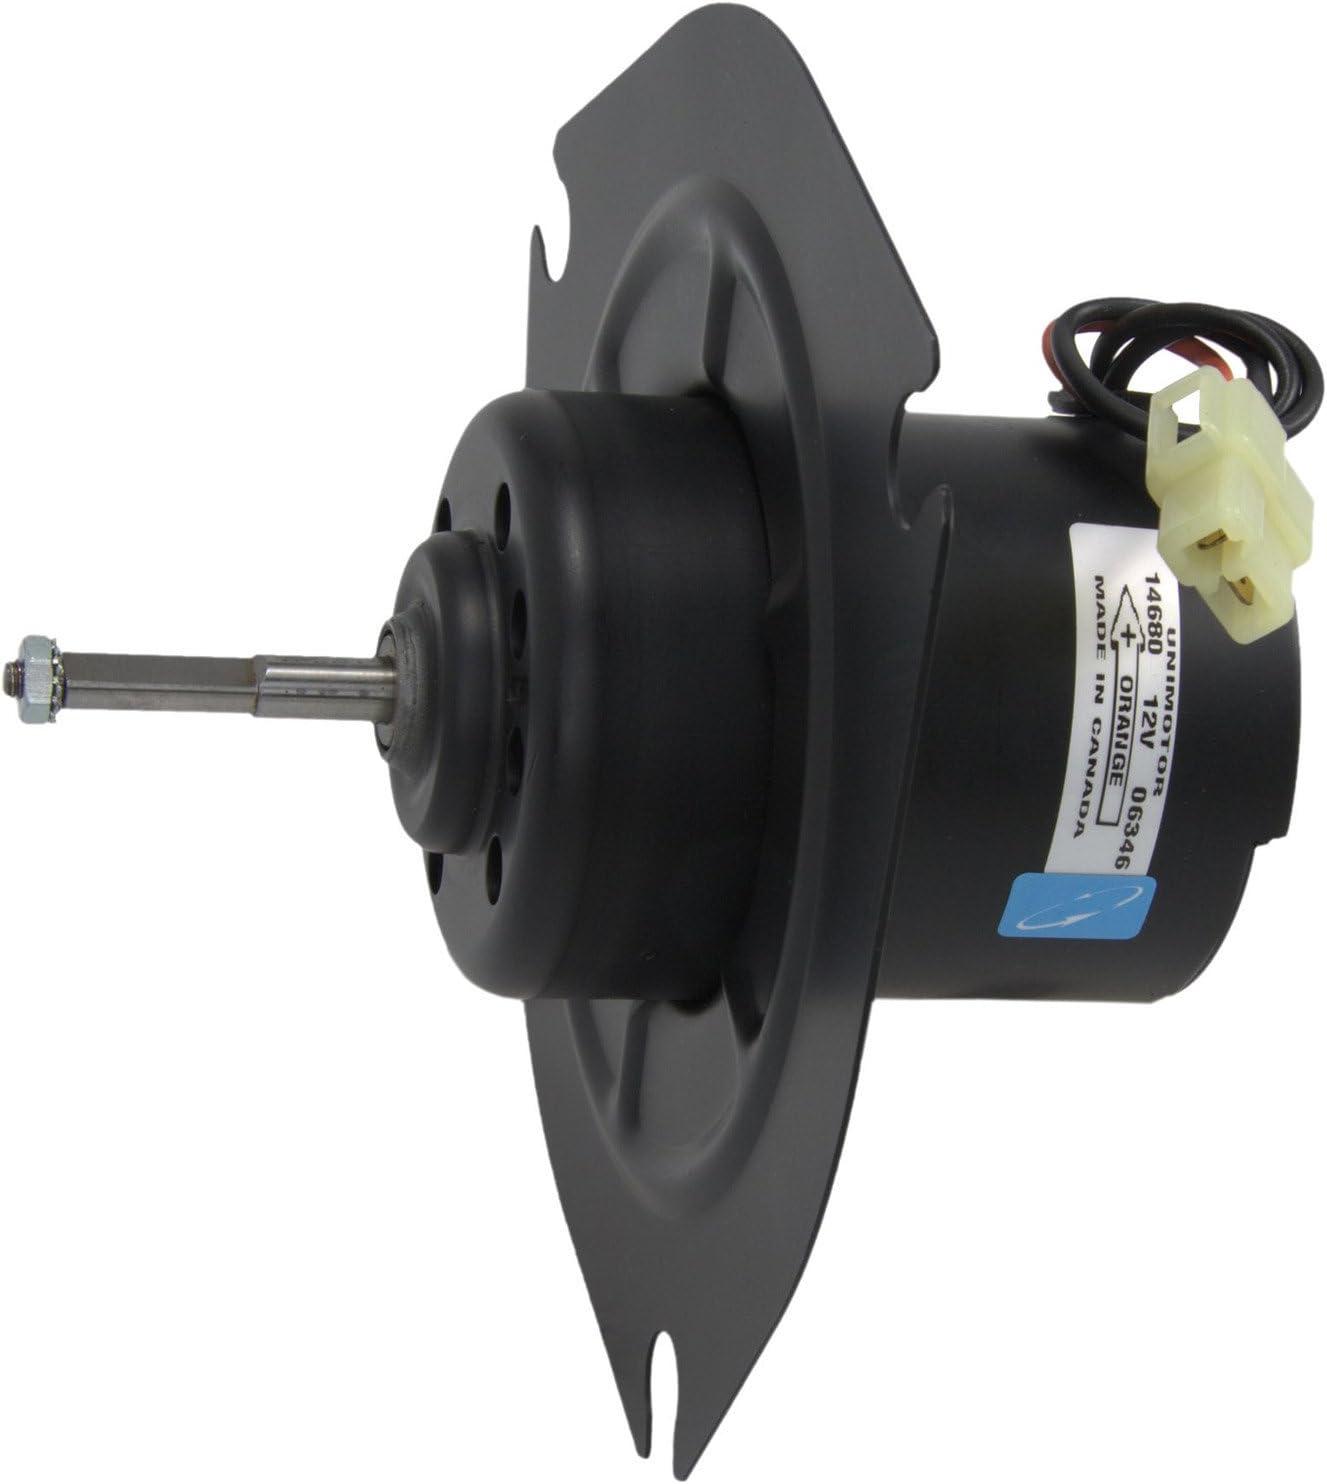 Four Seasons//Trumark 35501 Blower Motor without Wheel